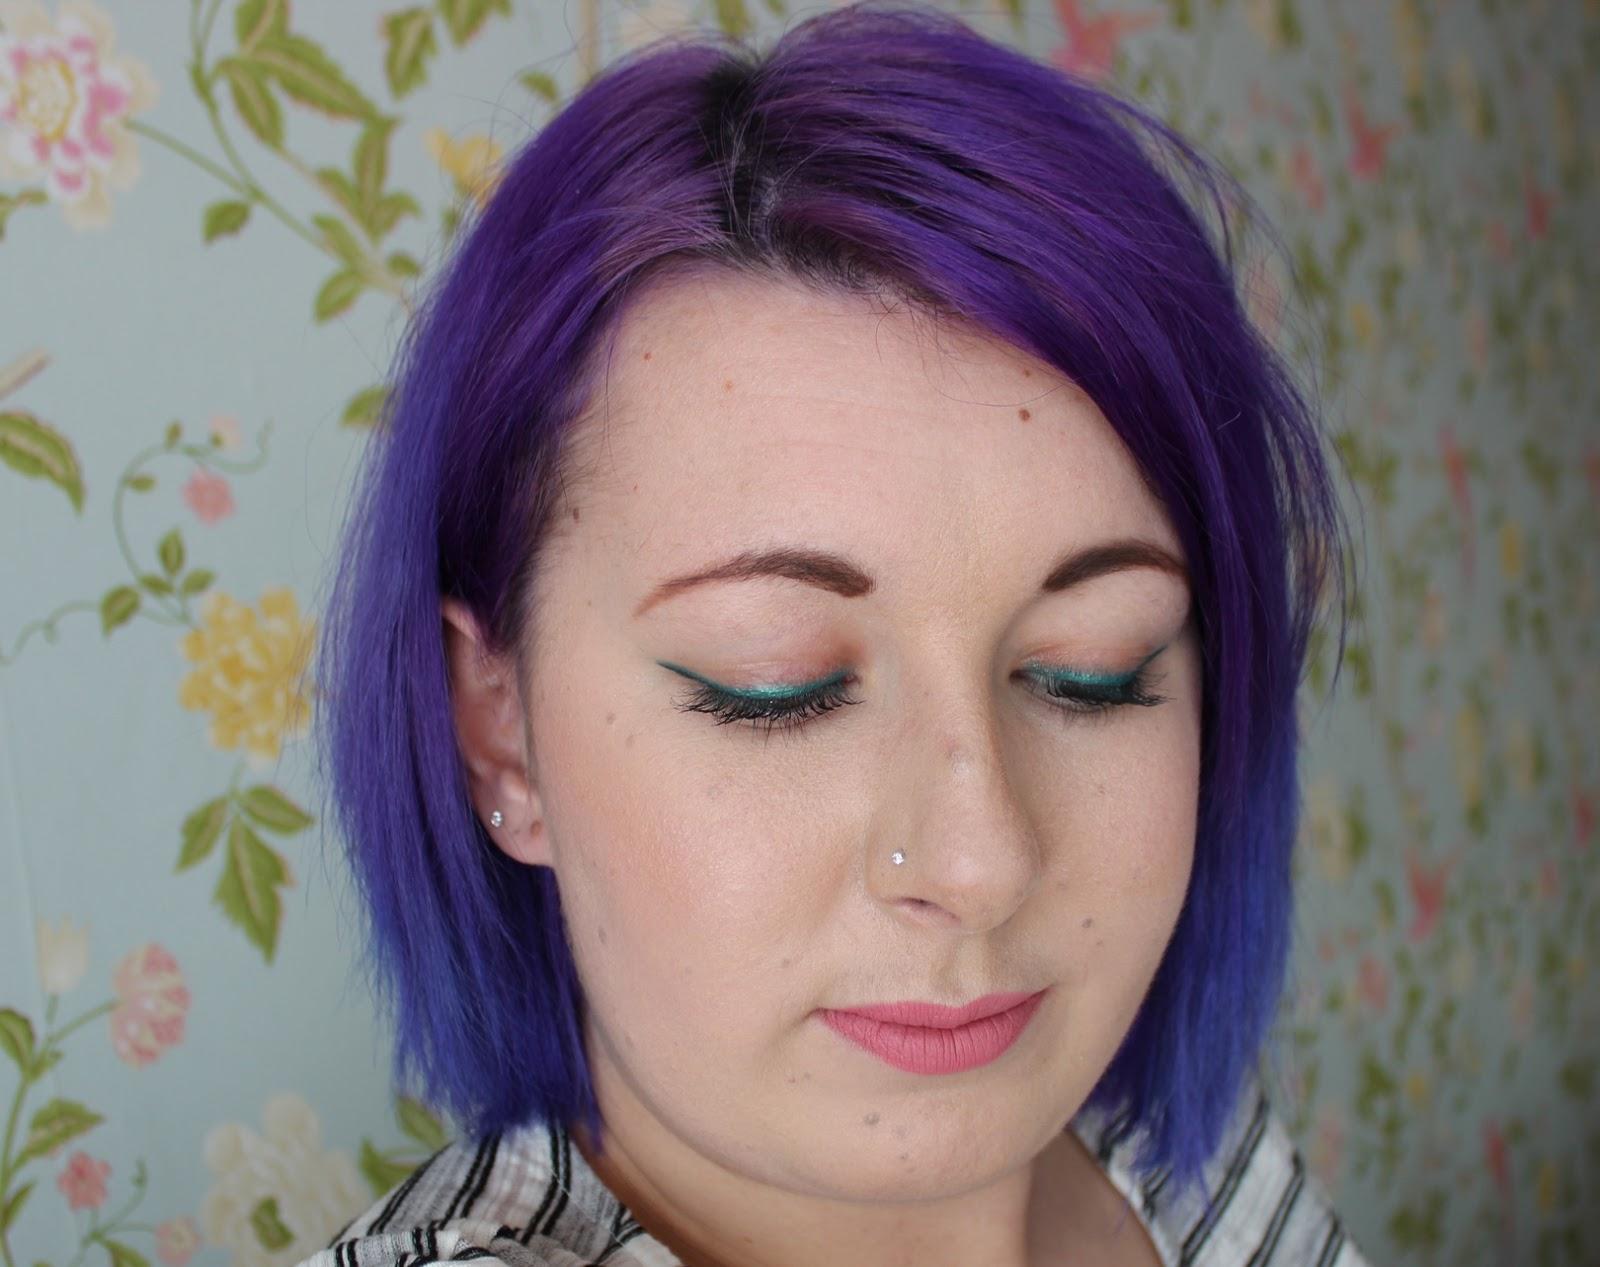 mac minted eye kohl beauty blog